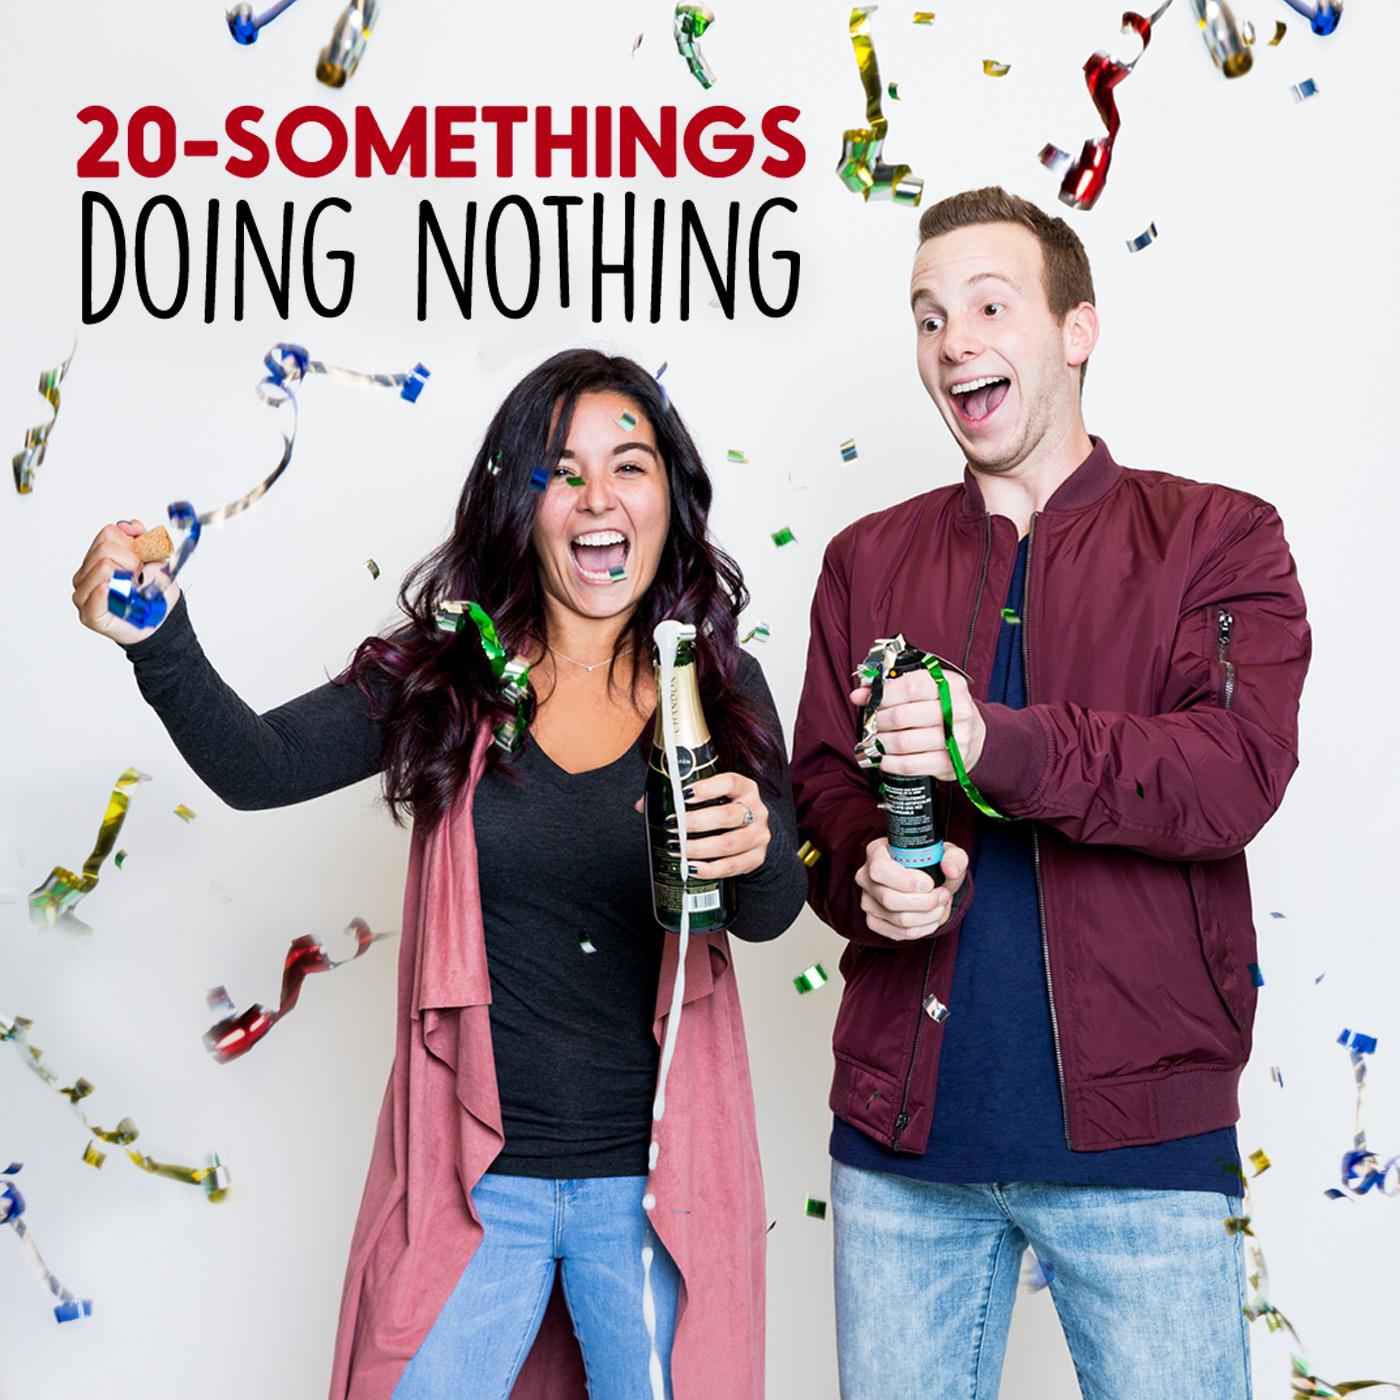 20-Somethings Doing Nothing